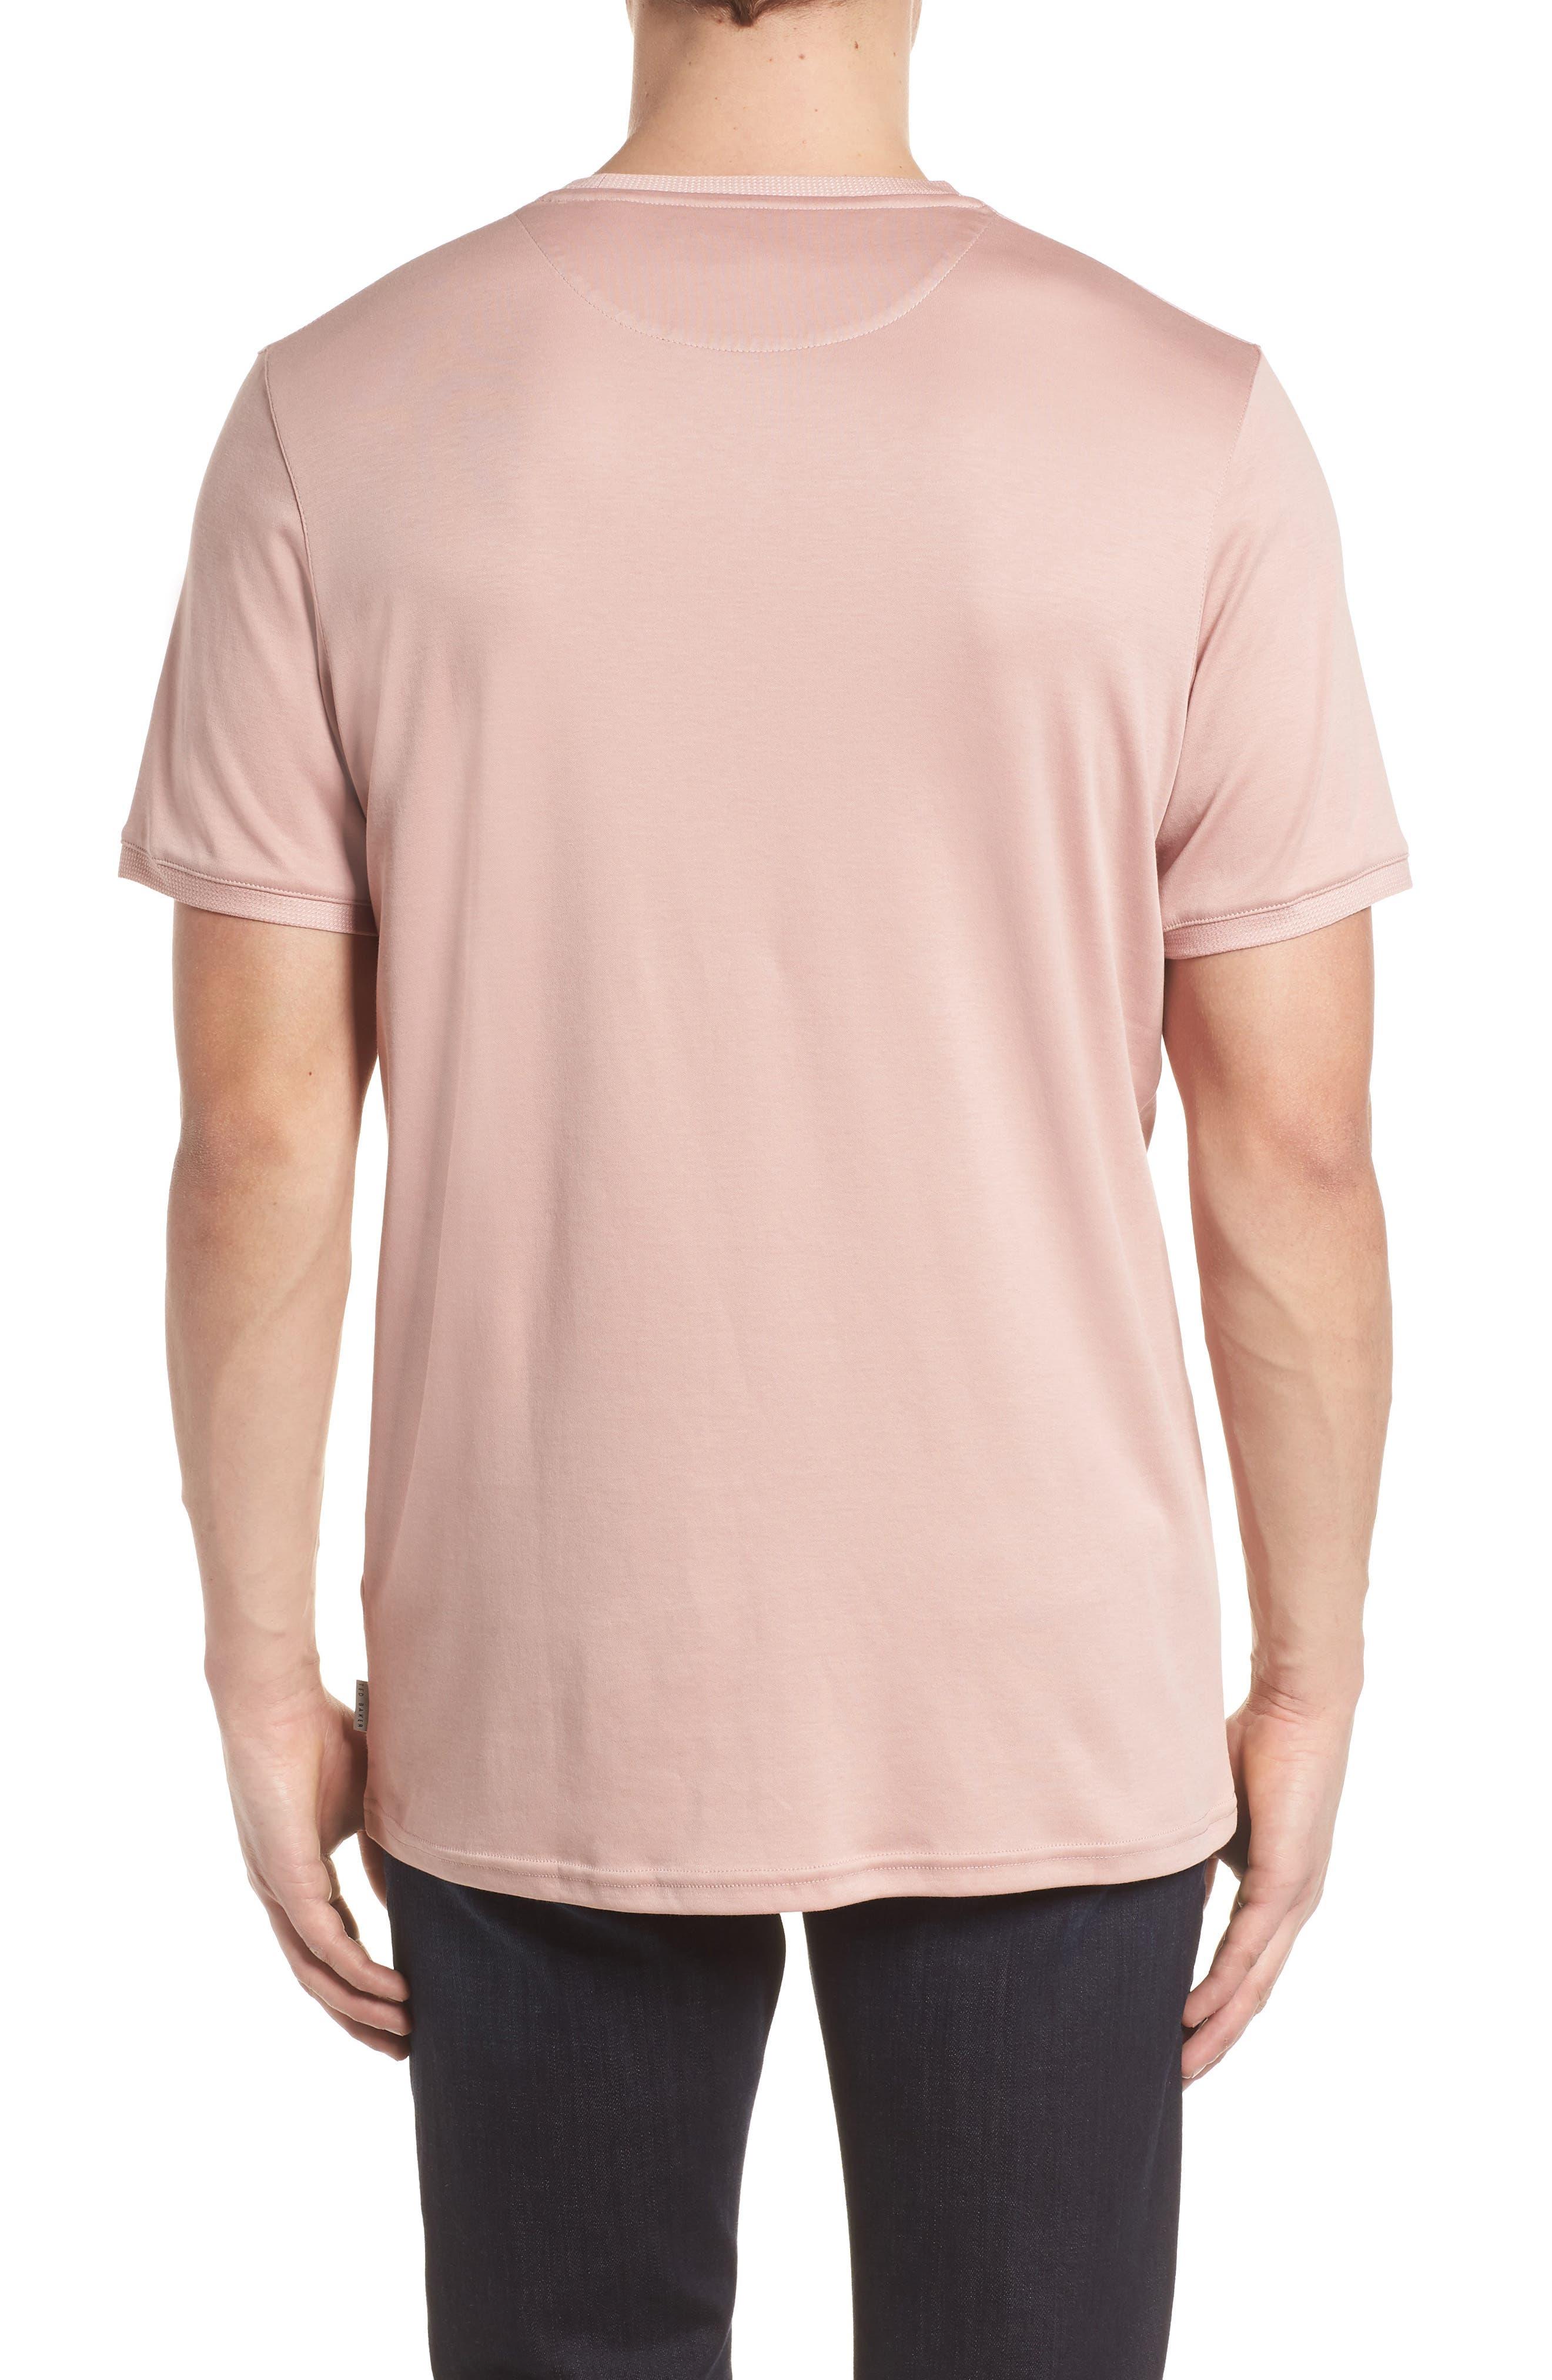 Piktt Crewneck T-Shirt,                             Alternate thumbnail 2, color,                             Dusky Pink